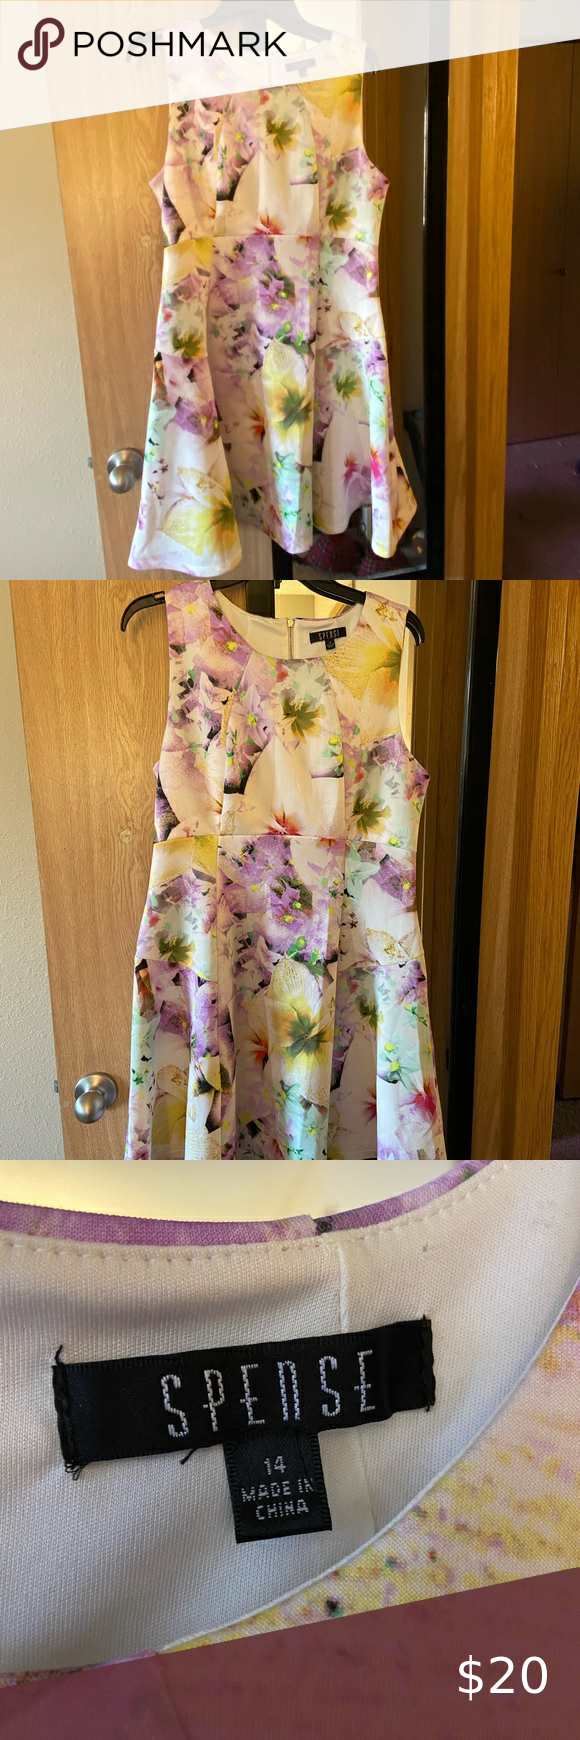 Summer Dress Size 14 Brand Spense Size 14 Condition Like New Spense Dresses Size 14 Dresses Summer Dresses Size 14 [ 1740 x 580 Pixel ]